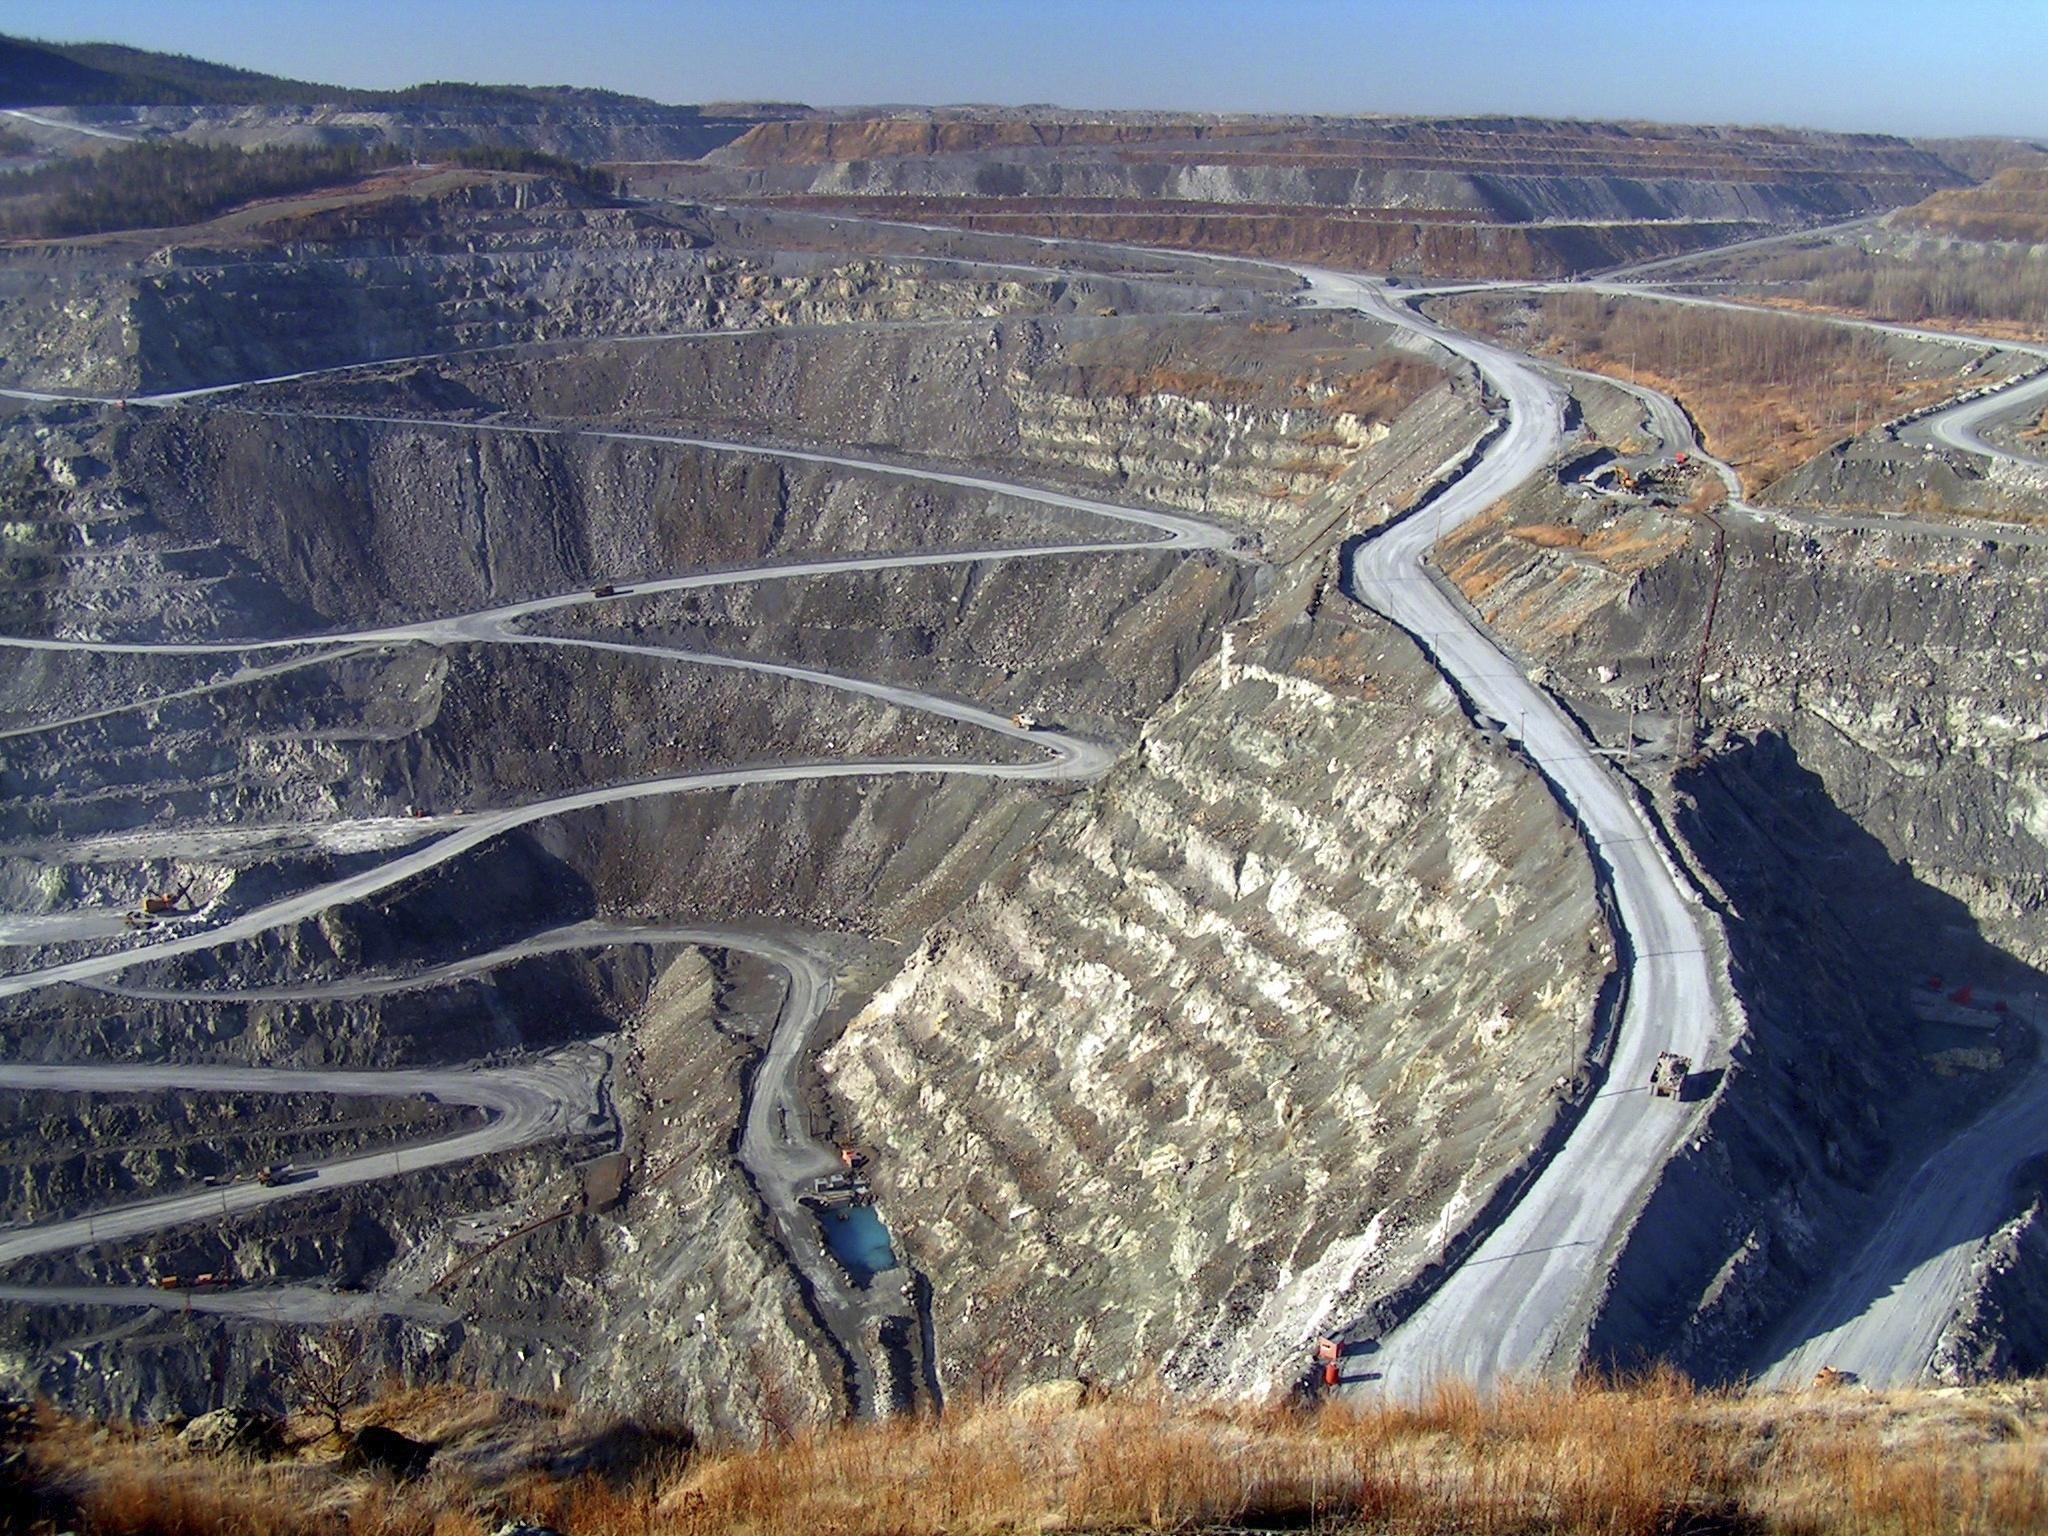 Asbestos Mining In Us : About asbestos surveys